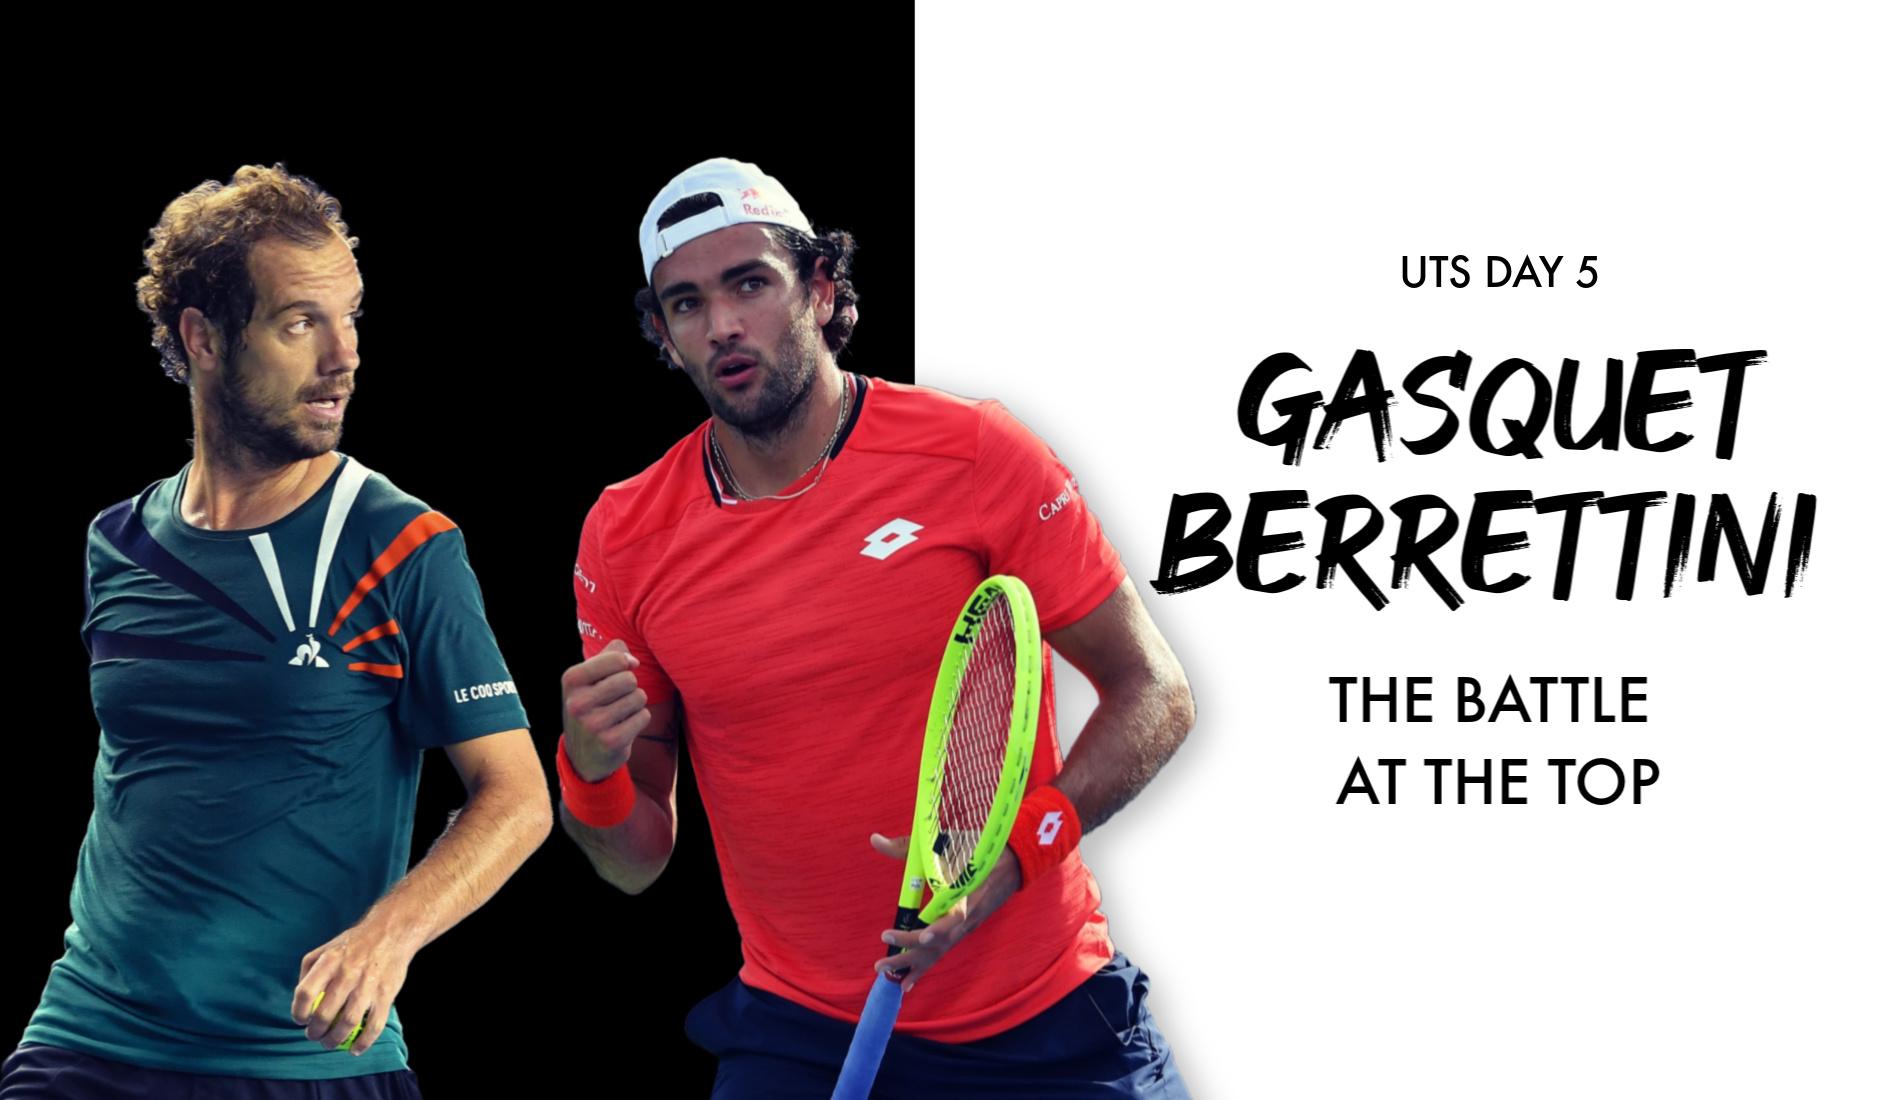 UTS Match Gasquet - Berrettini (title) Day 5